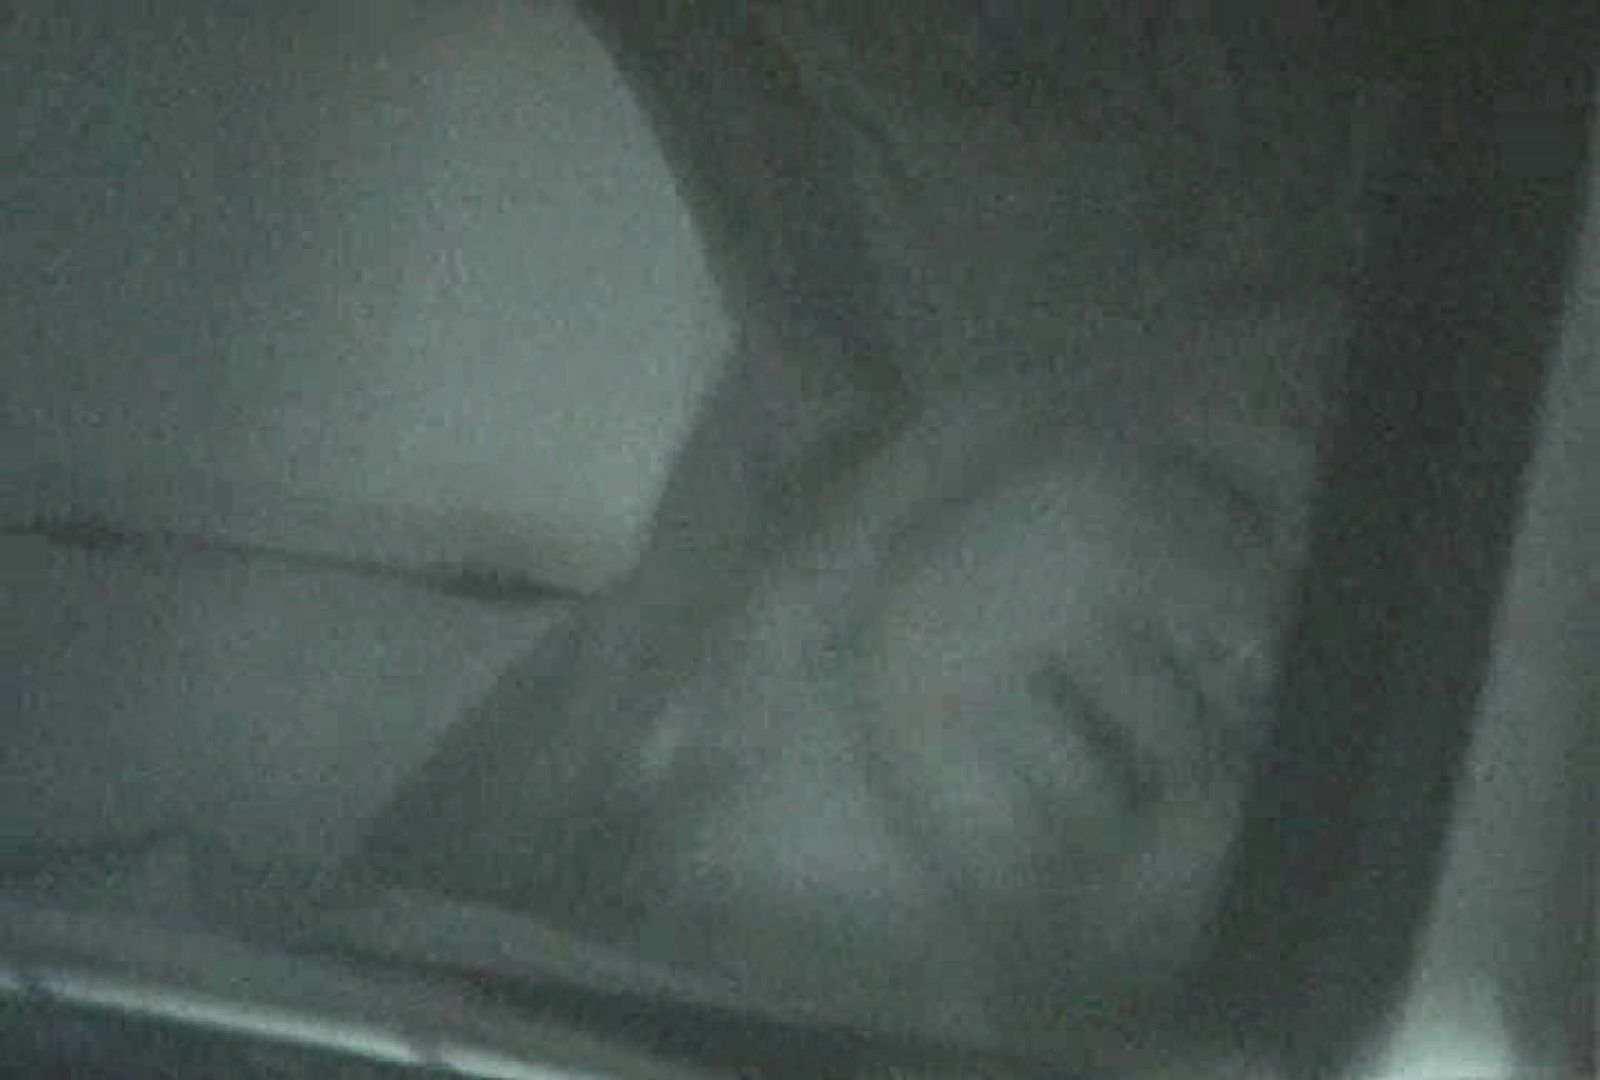 充血監督の深夜の運動会Vol.42 女子風呂盗撮 オメコ無修正動画無料 55画像 28